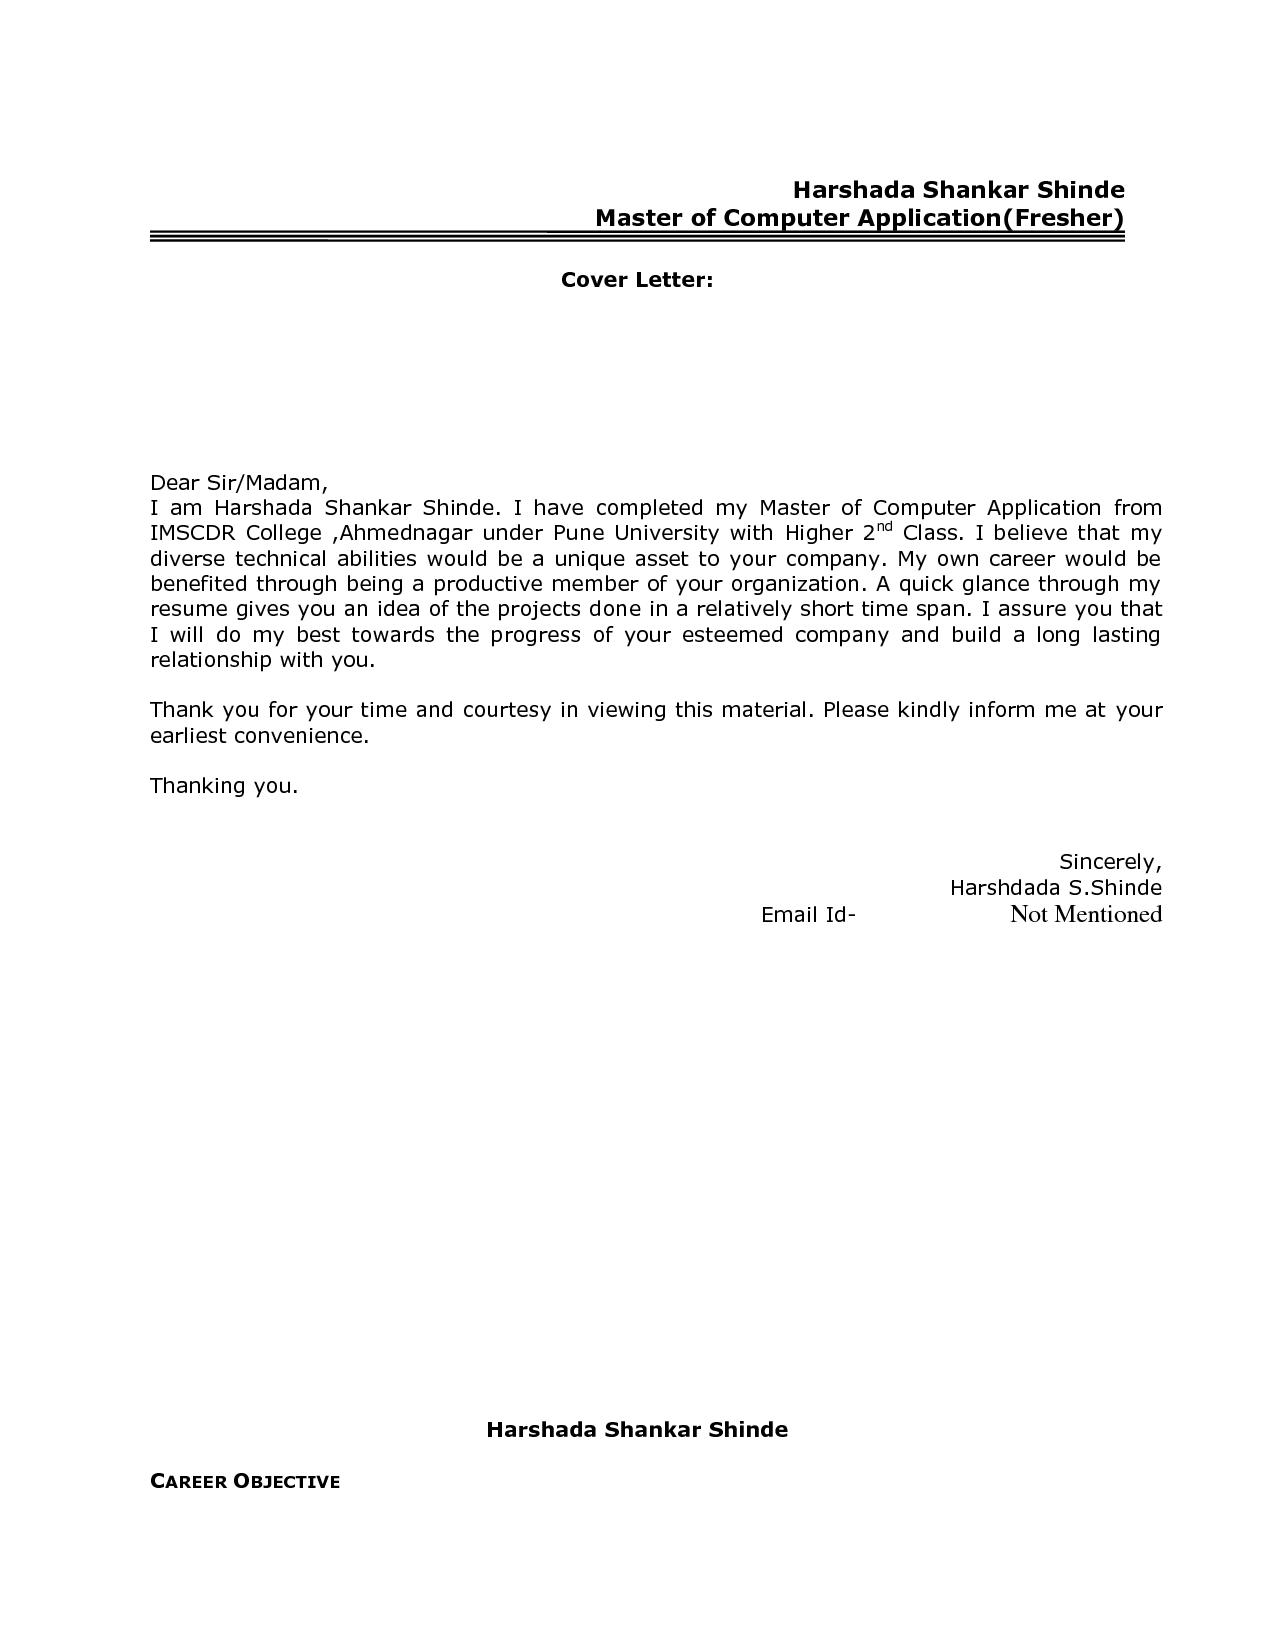 sample cover letter for resume for it freshers